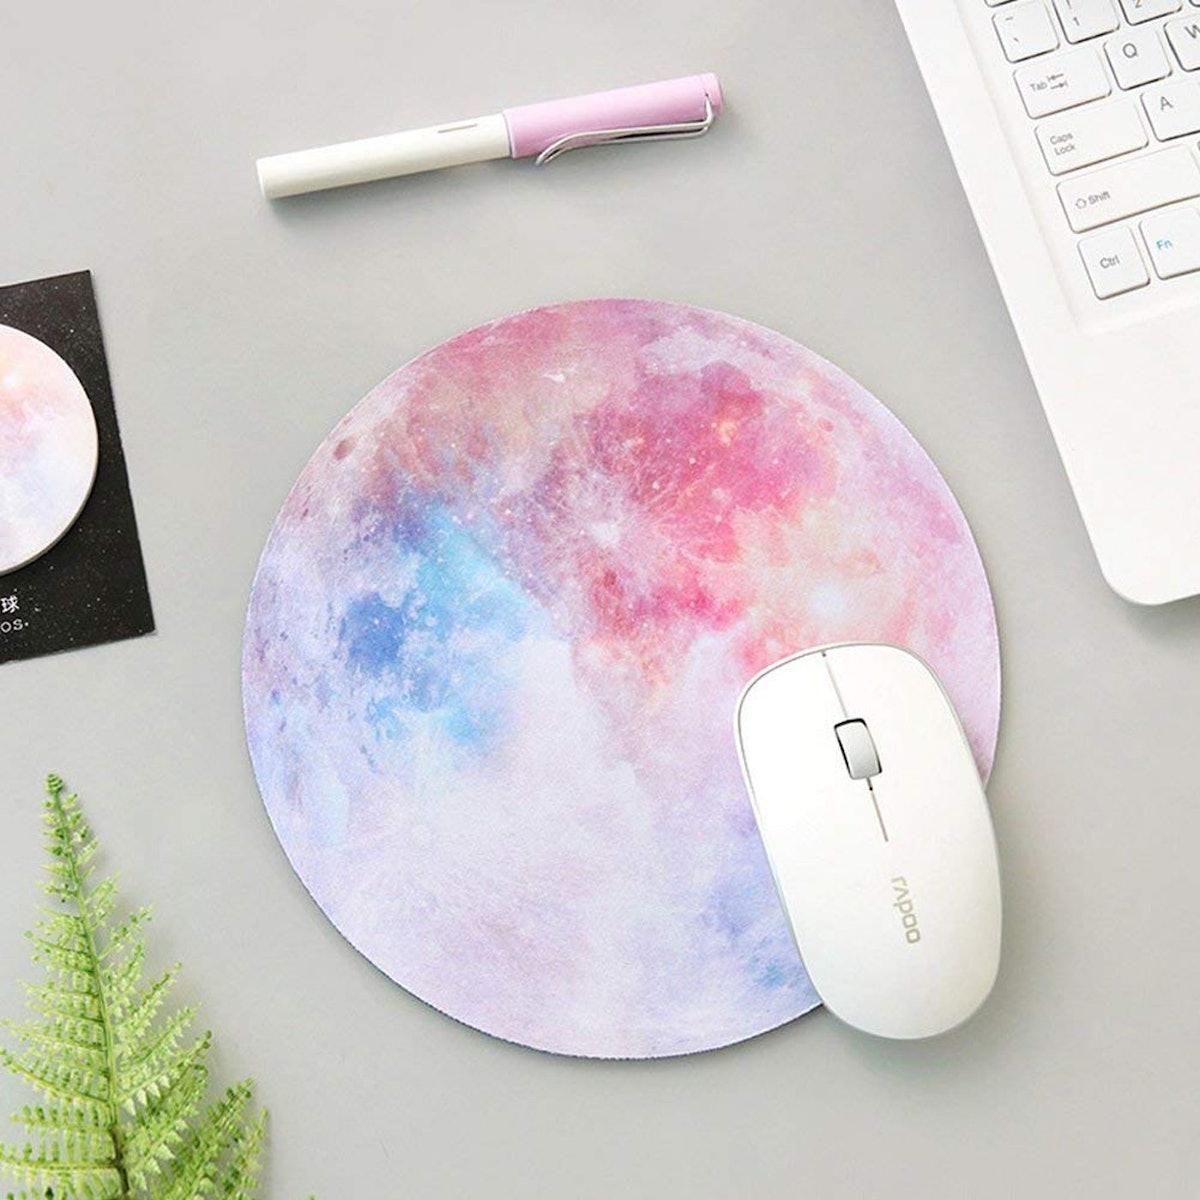 HaloVa Planet Mouse Pad